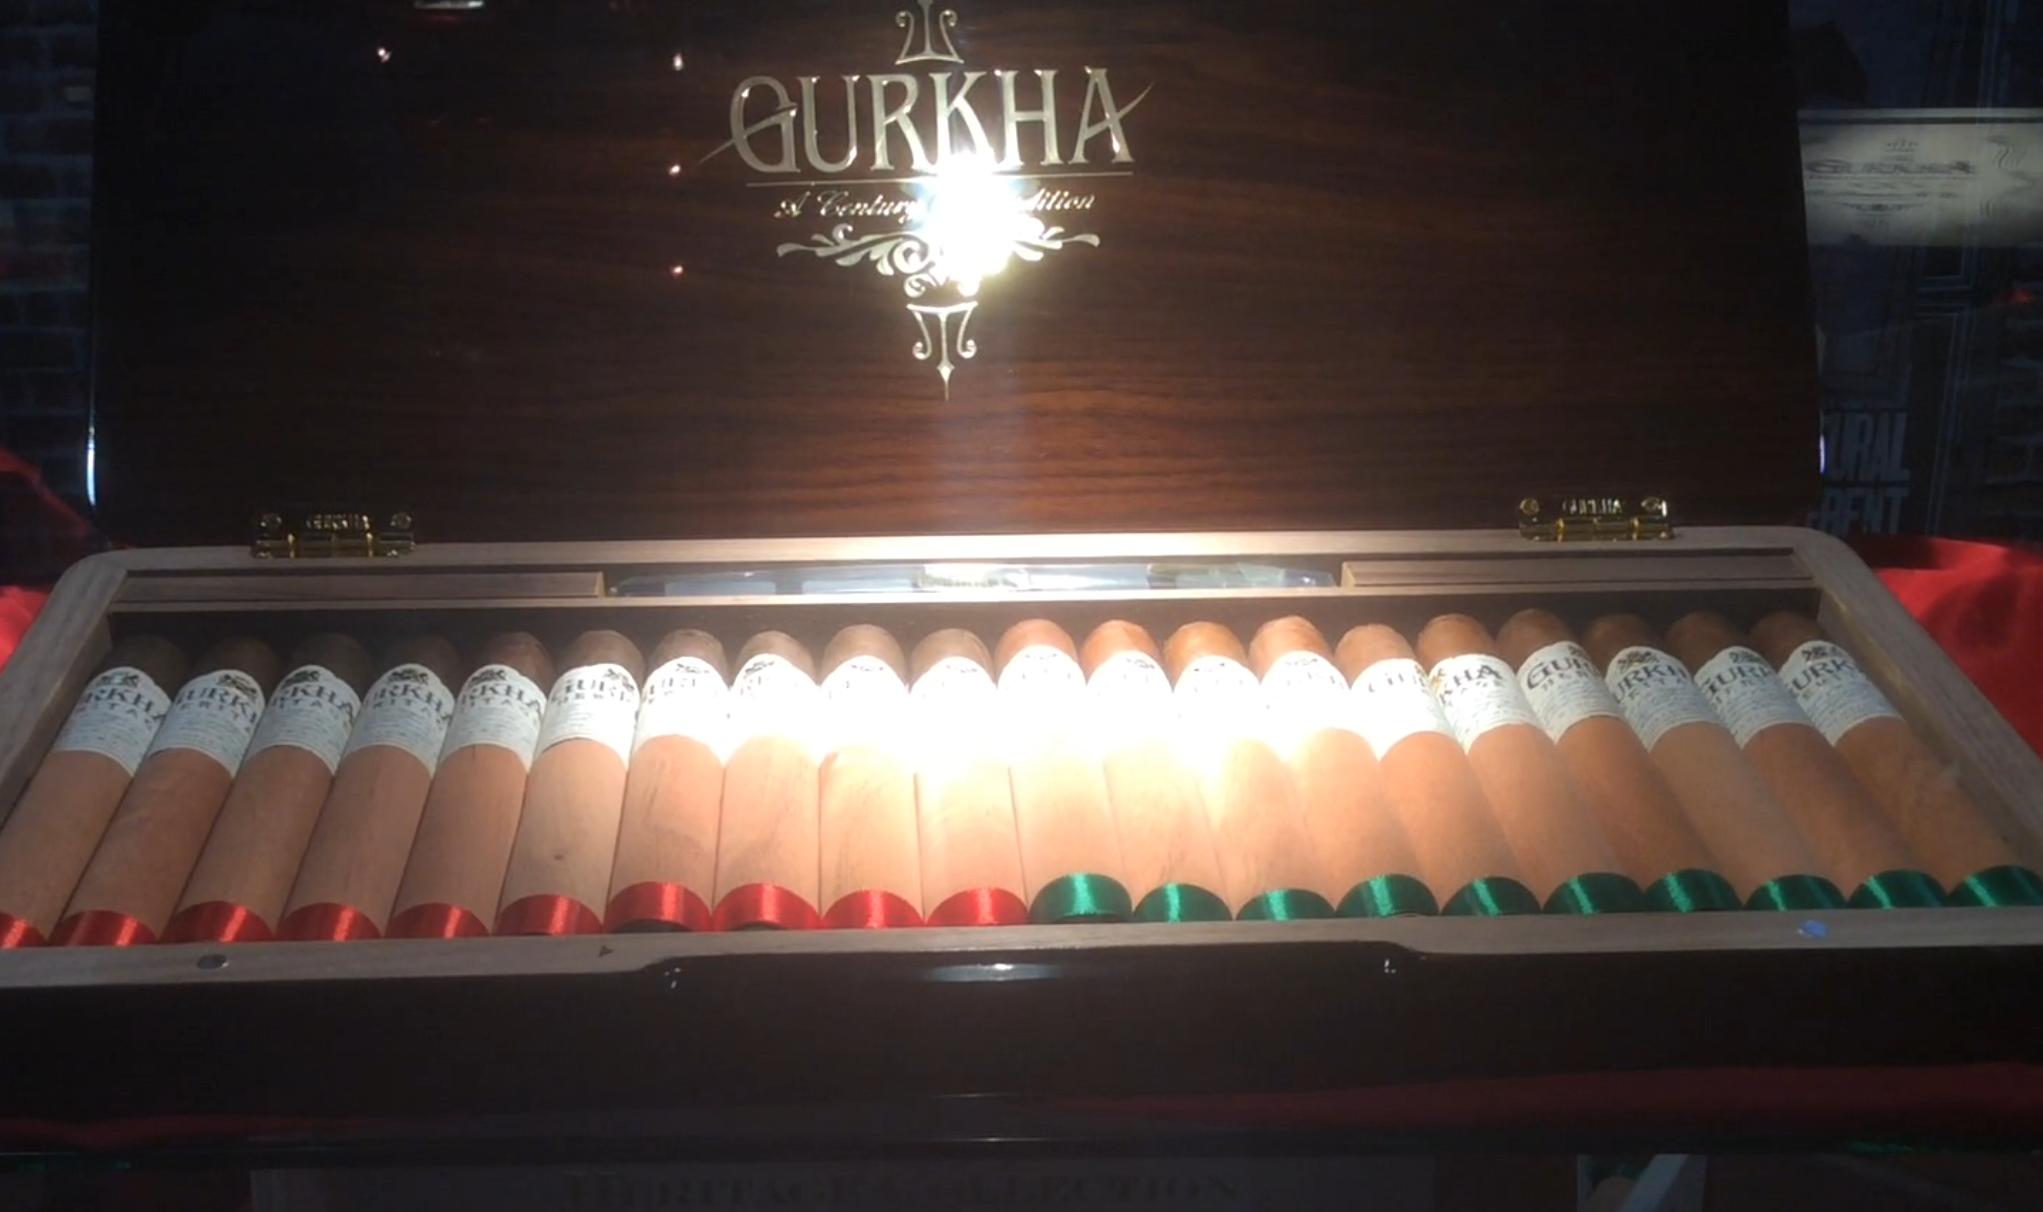 Gurkha_Heritage_Humidor